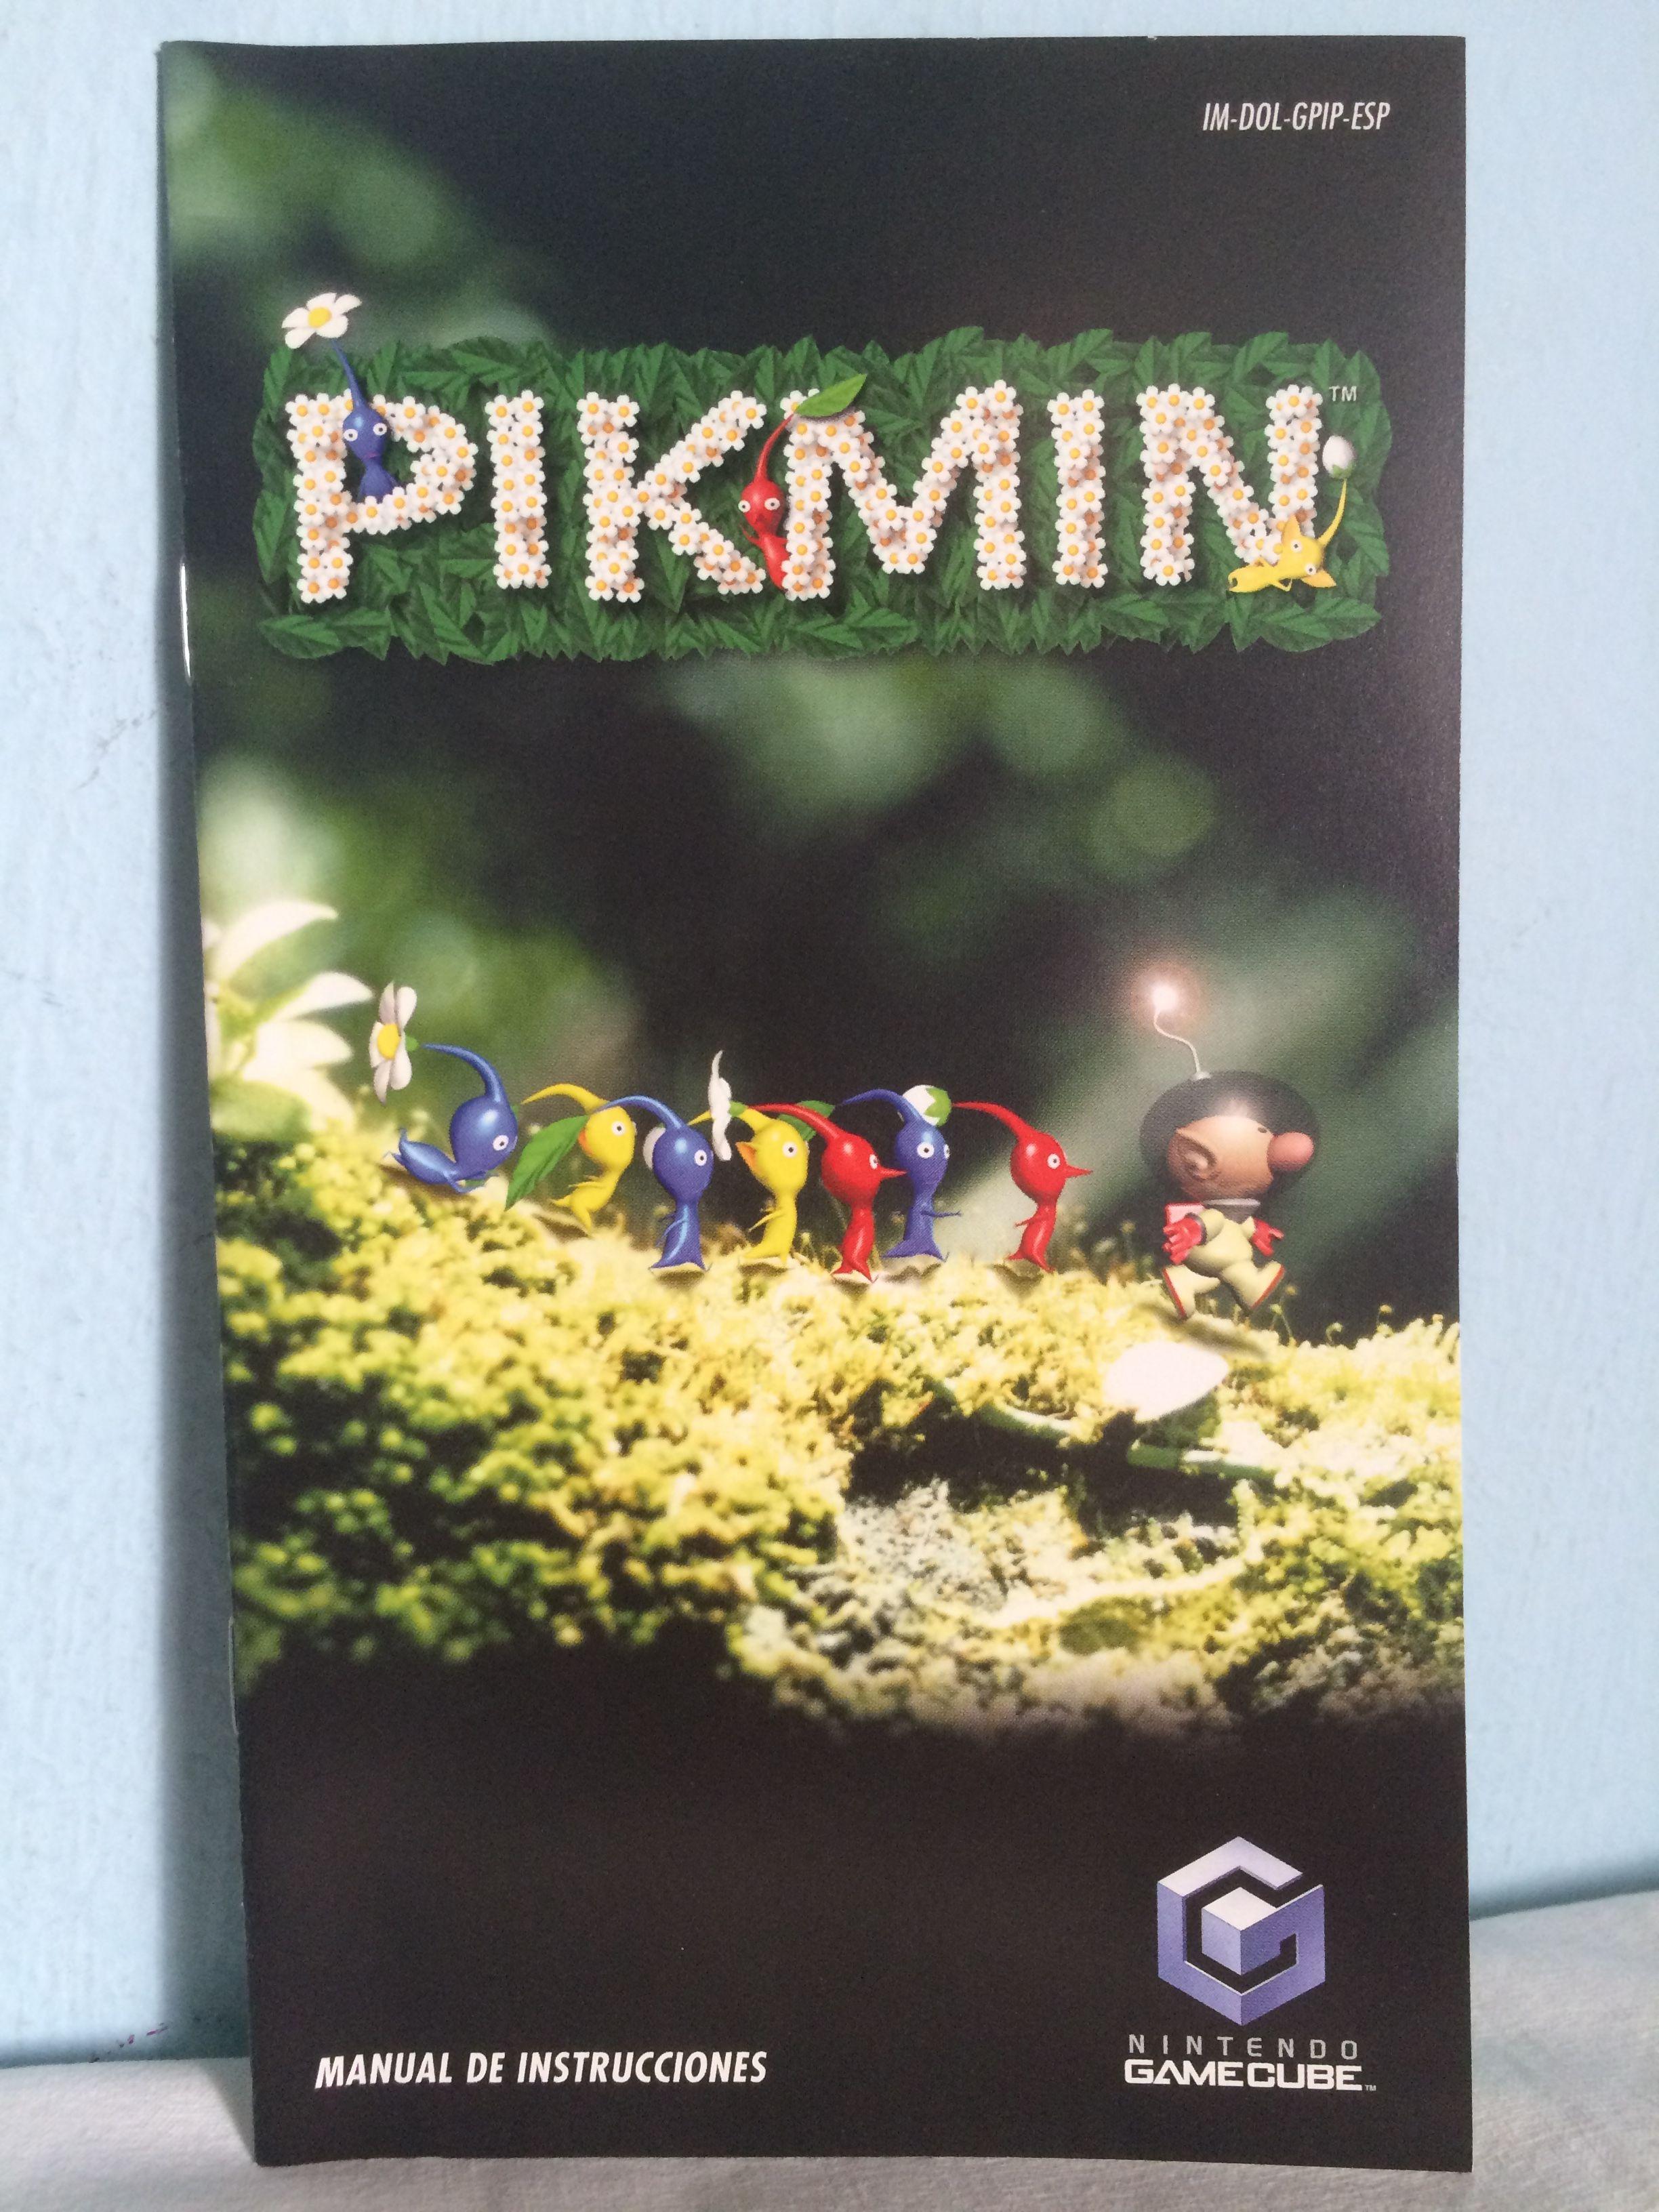 pikmin manual pikmin gamecube pinterest school videos and rh pinterest com Custom GameCube GameCube Carrying Case